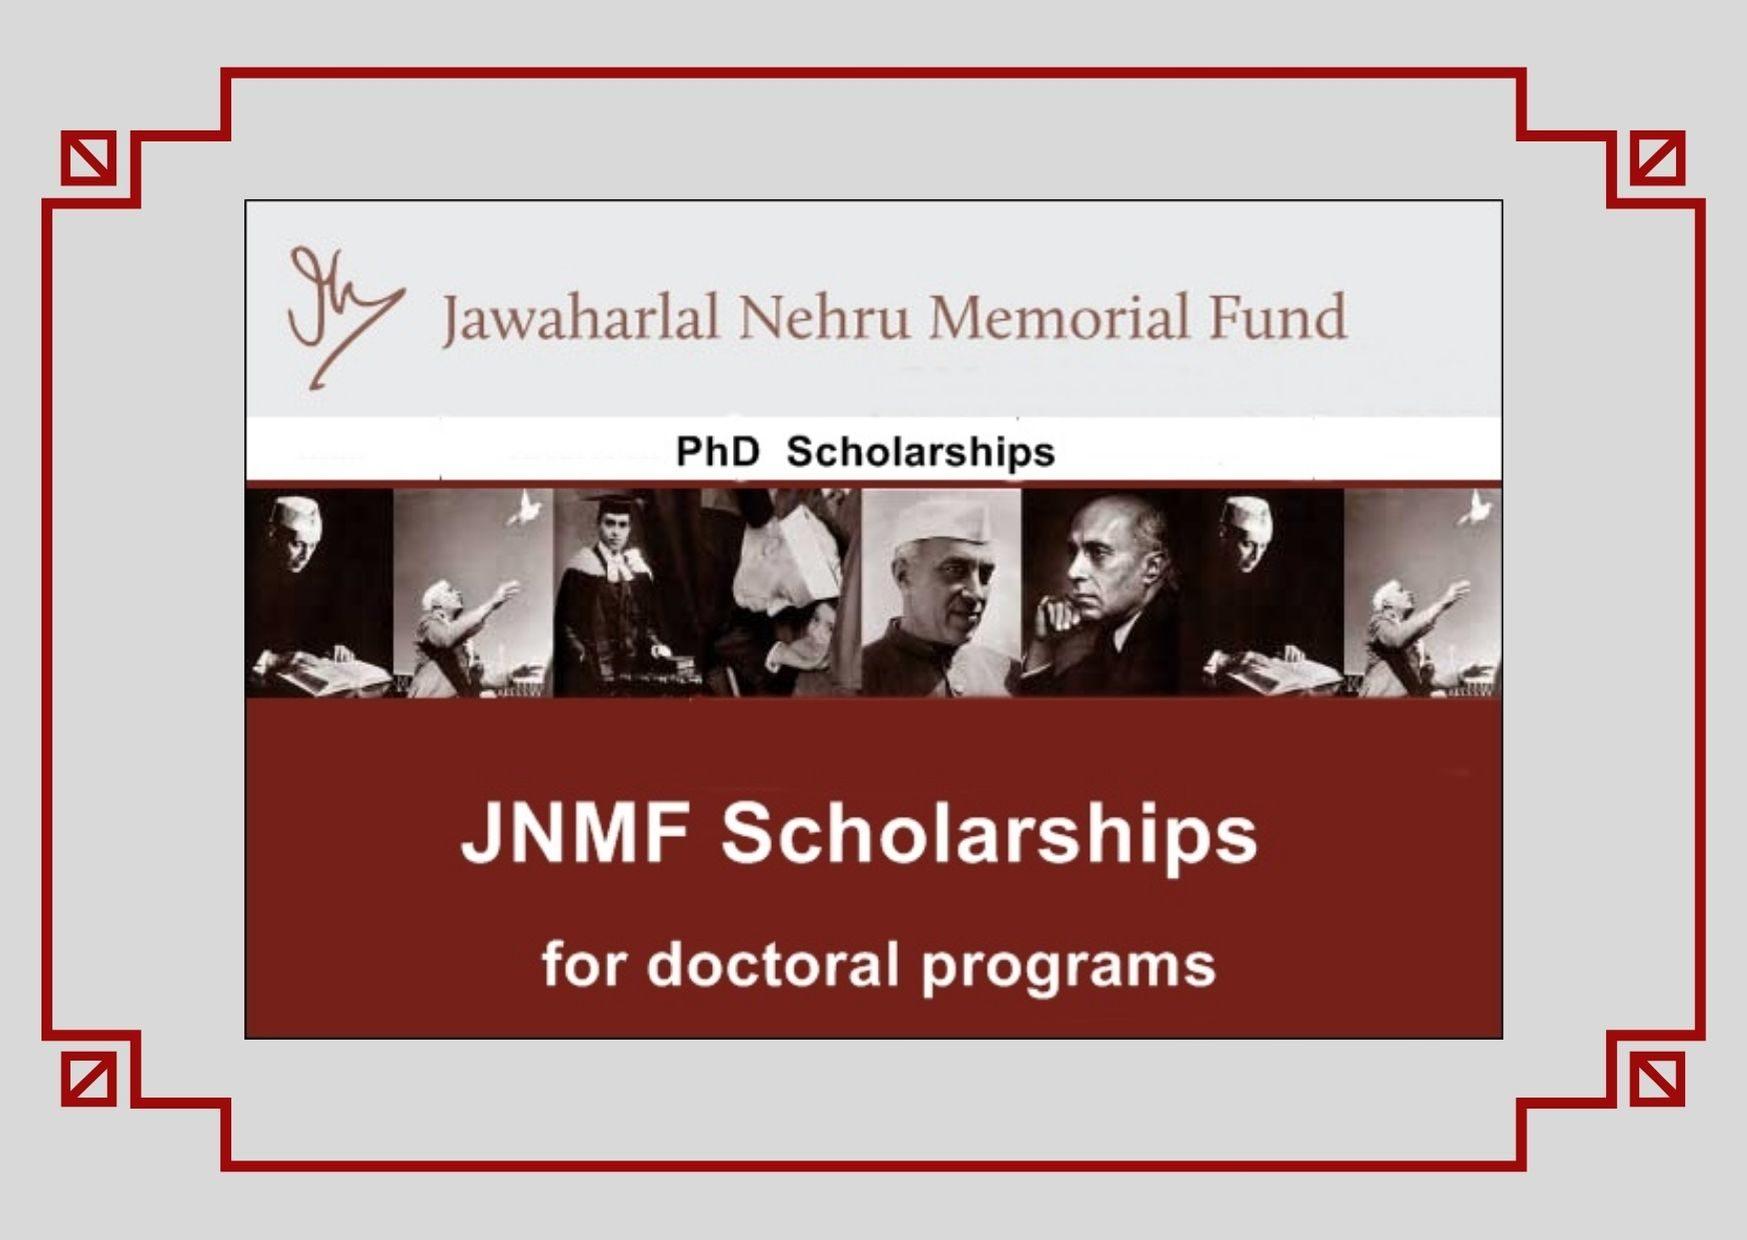 JNMF Scholarship 2021 Apply Eligibility Criteria jnmf.in